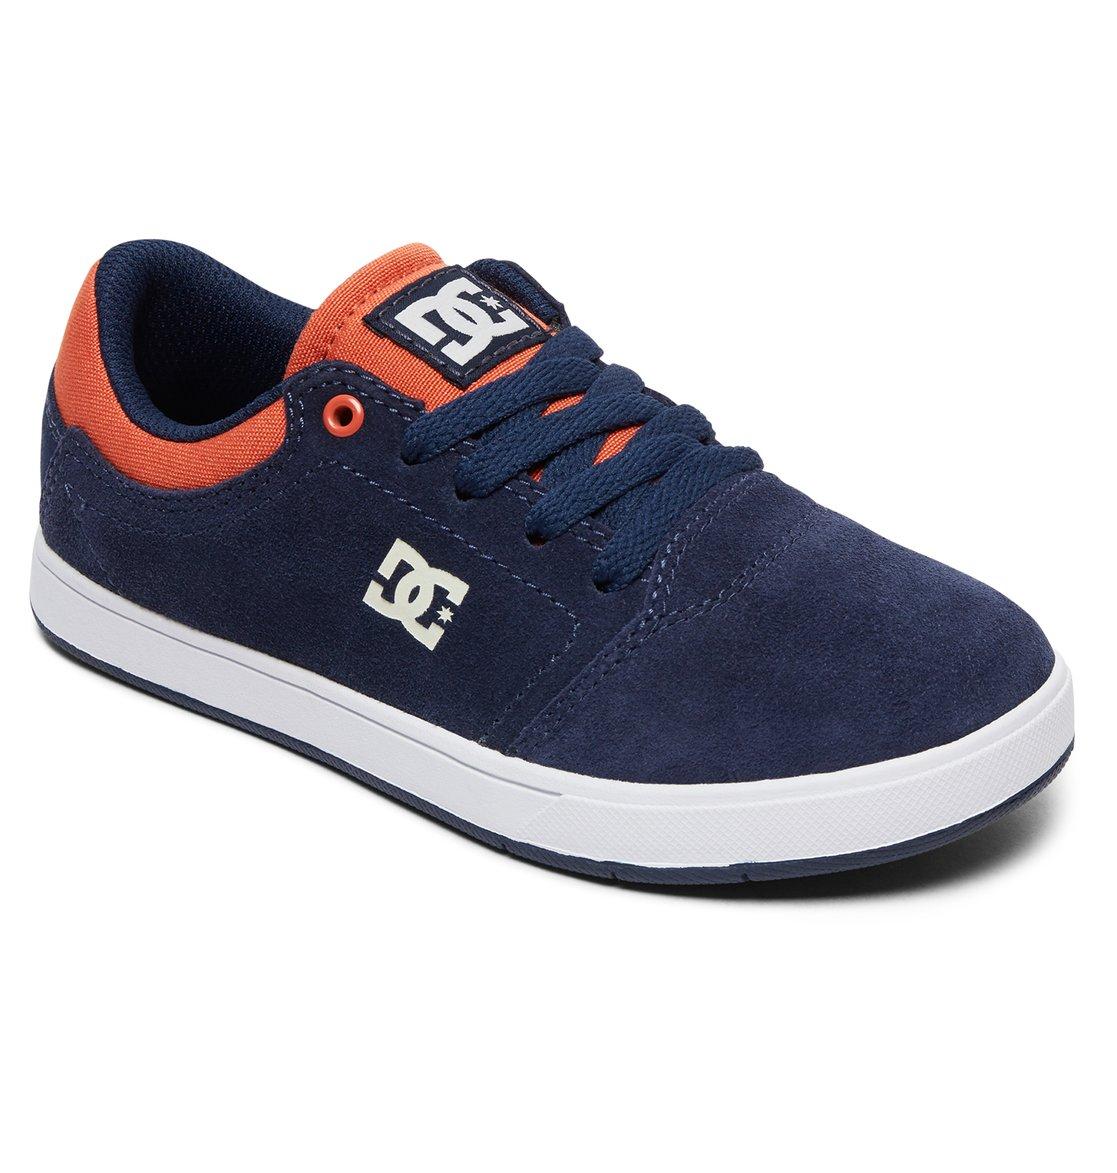 Dc Shoes para niños. Talla 35,5